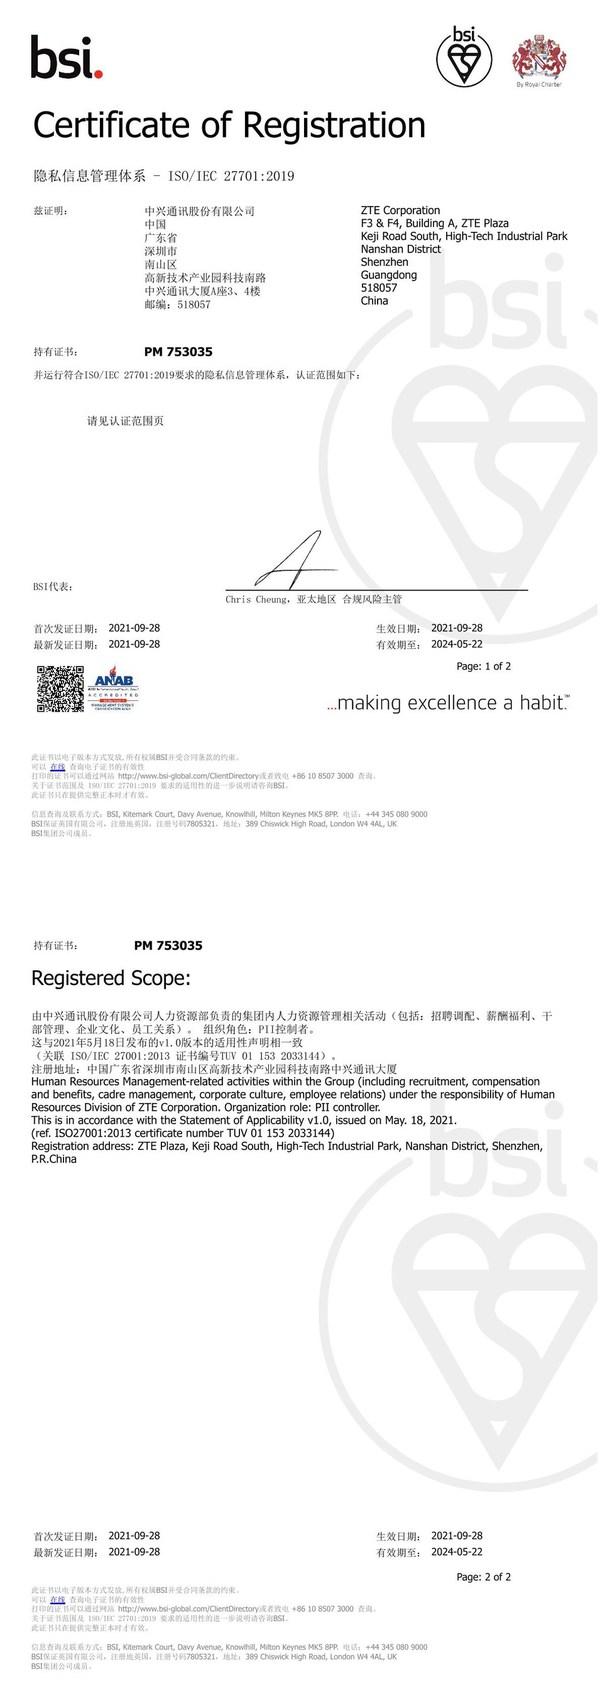 ZTE, 인적자원관리 분야에서 ISO/IEC 27701:2019 인증 획득